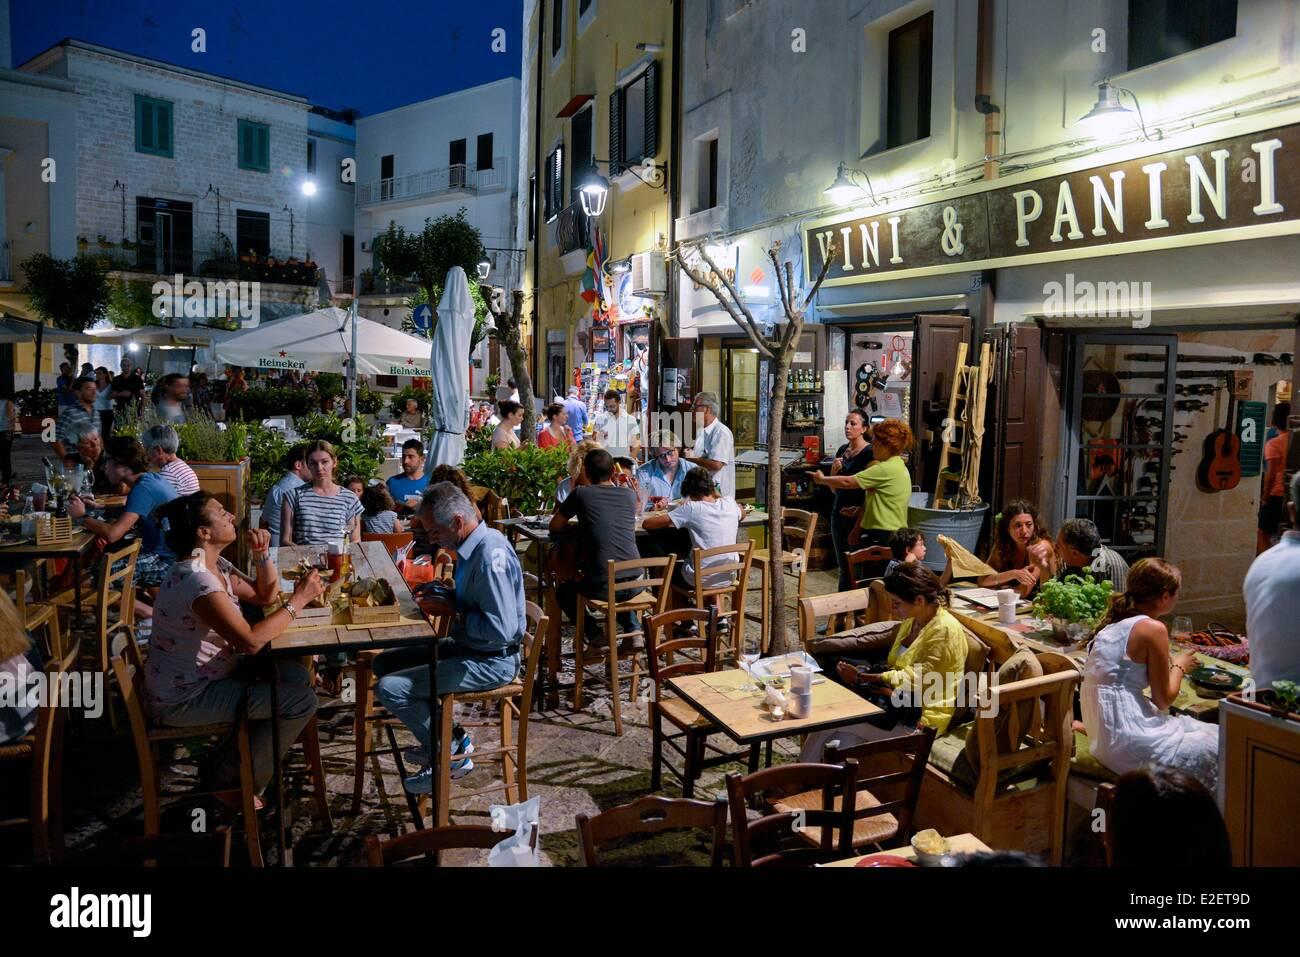 Bari Restaurant Sign